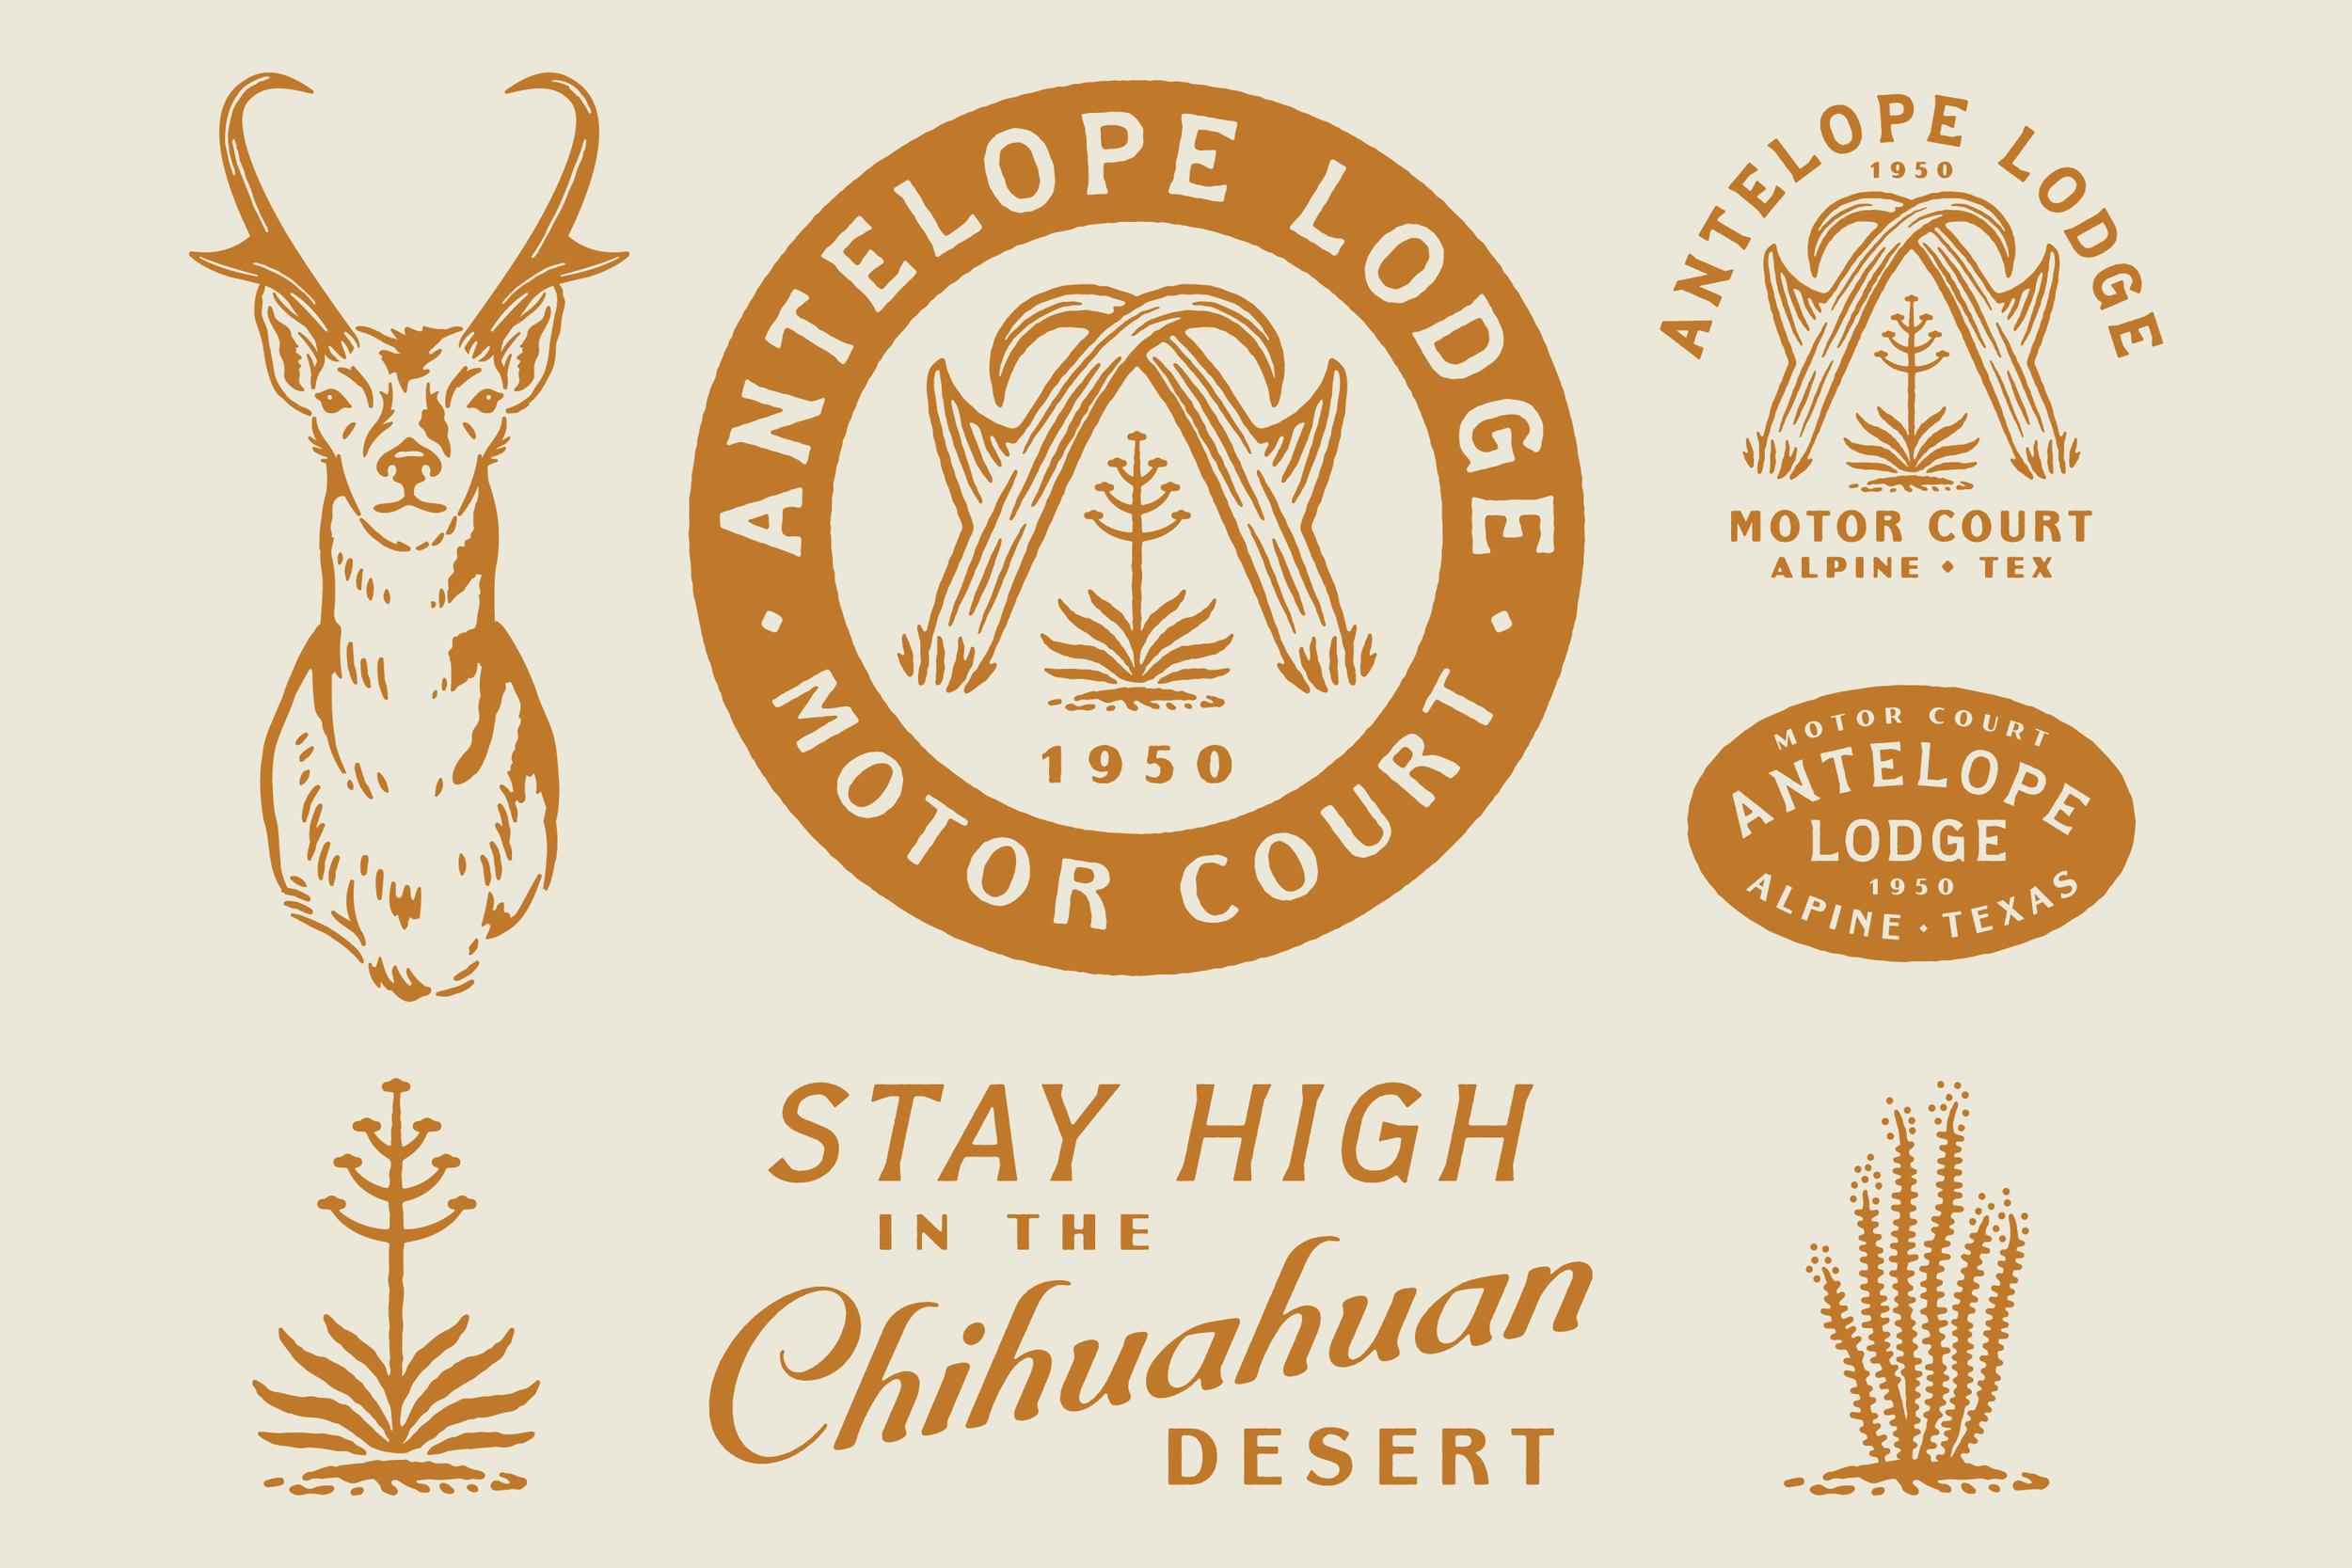 Antelope Lodge Branding Suite